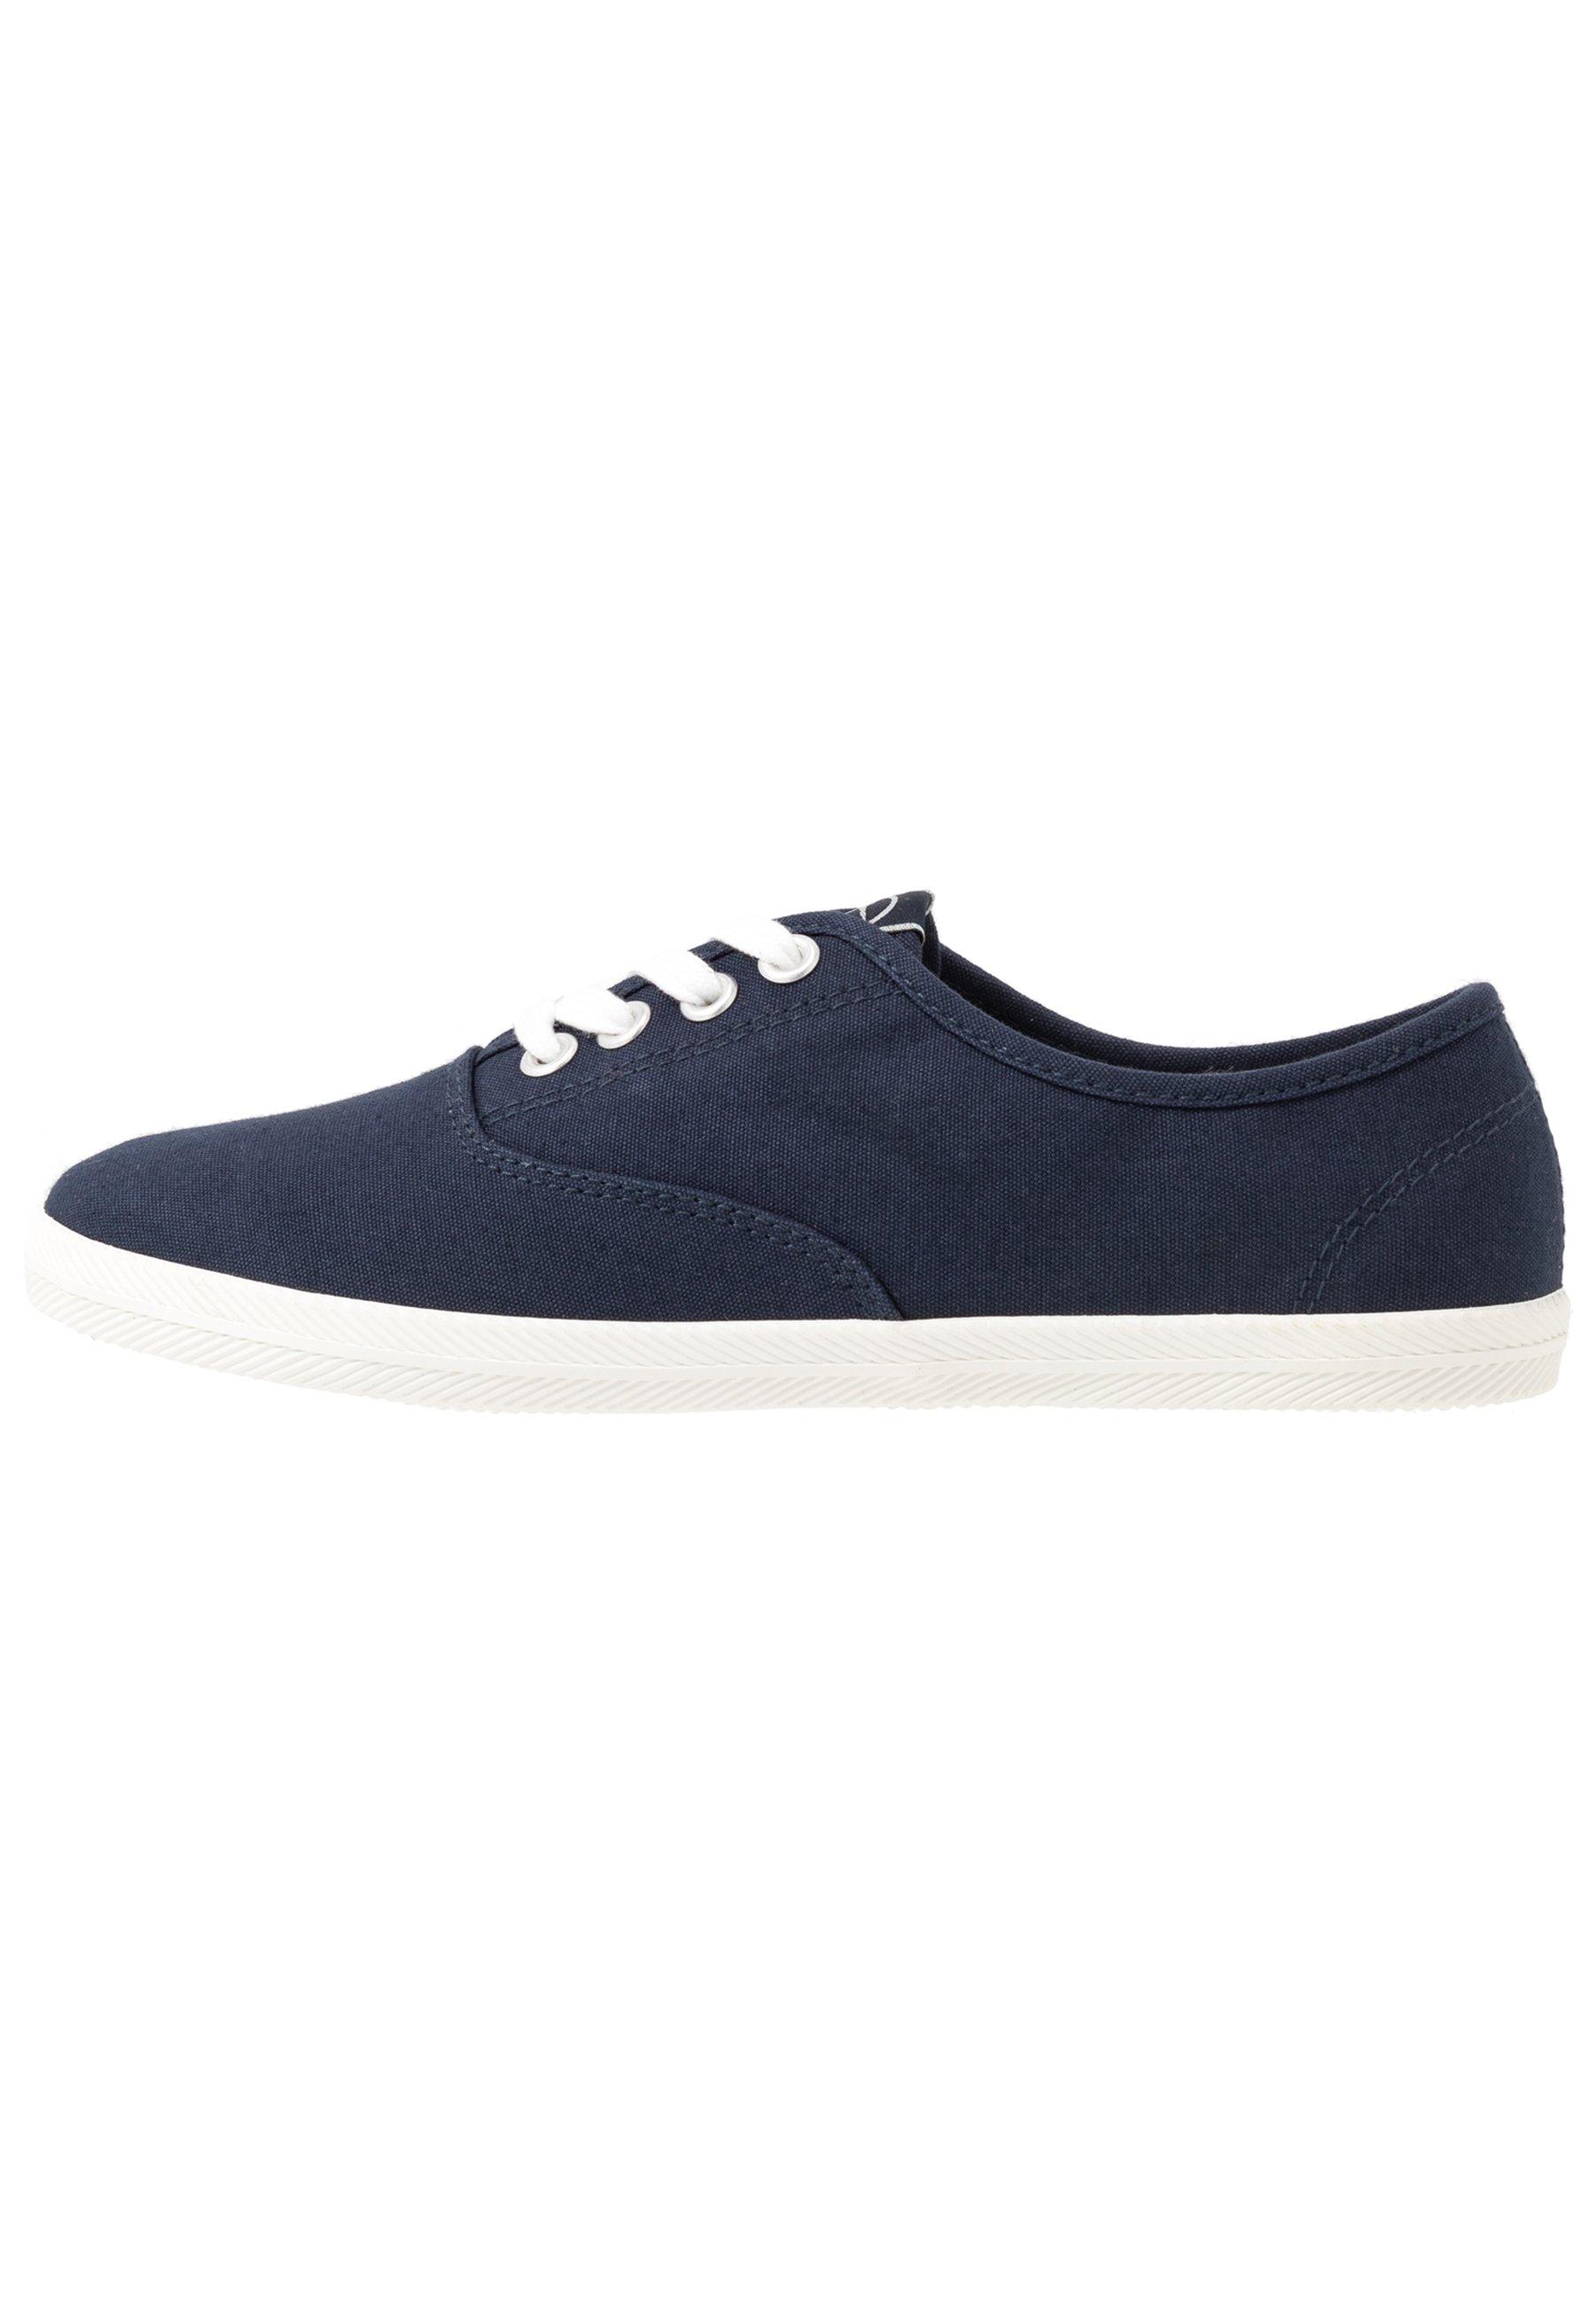 Tamaris Sneakers - Navy